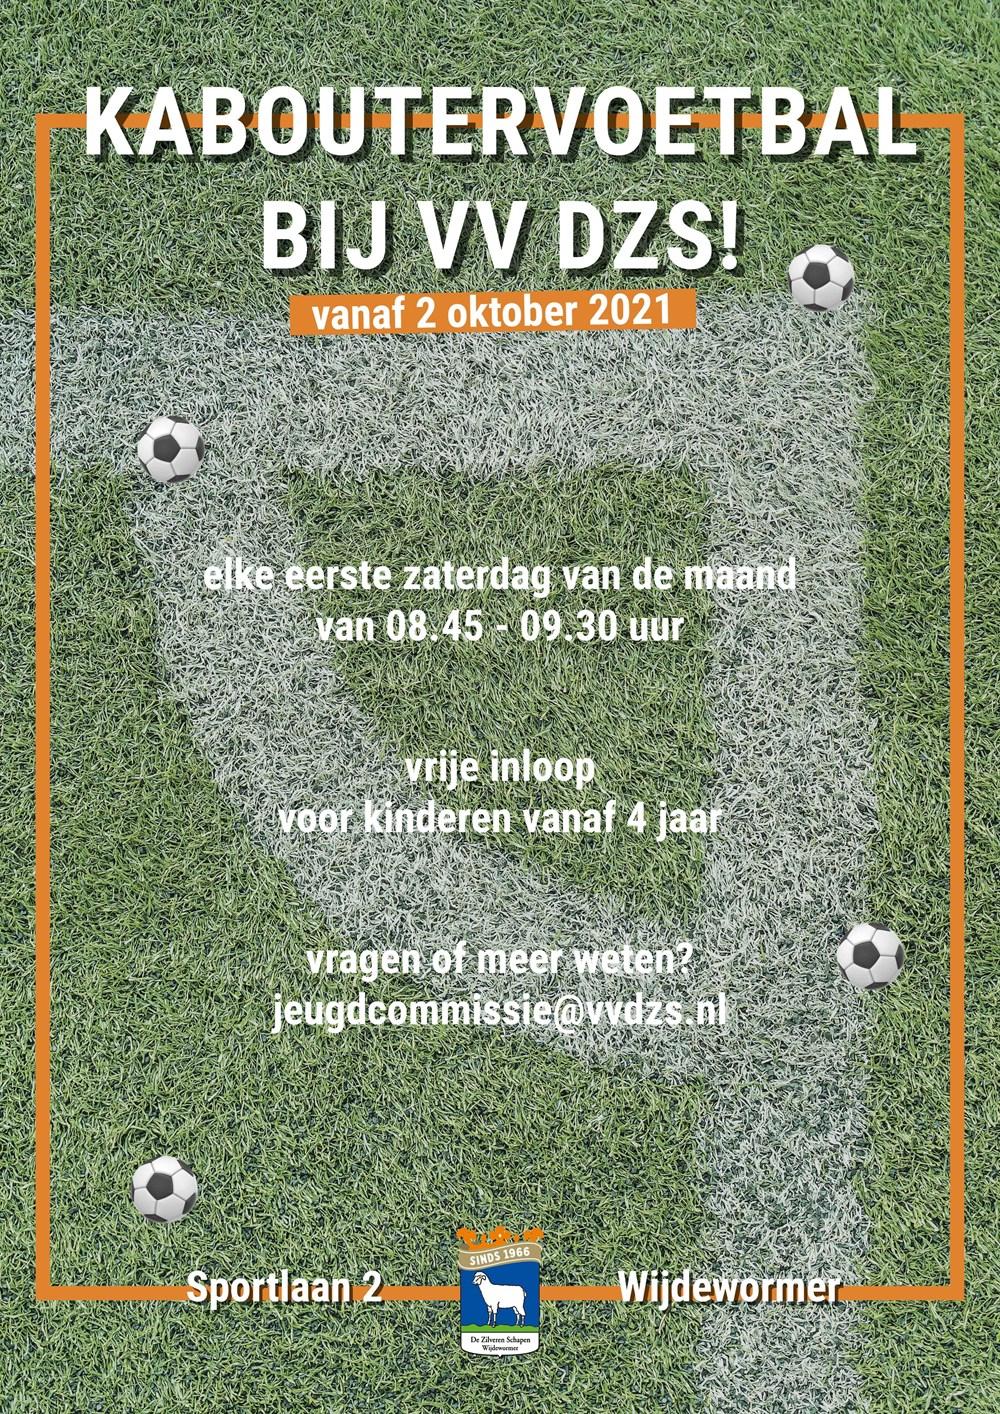 Kaboutervoetbal_002.jpg